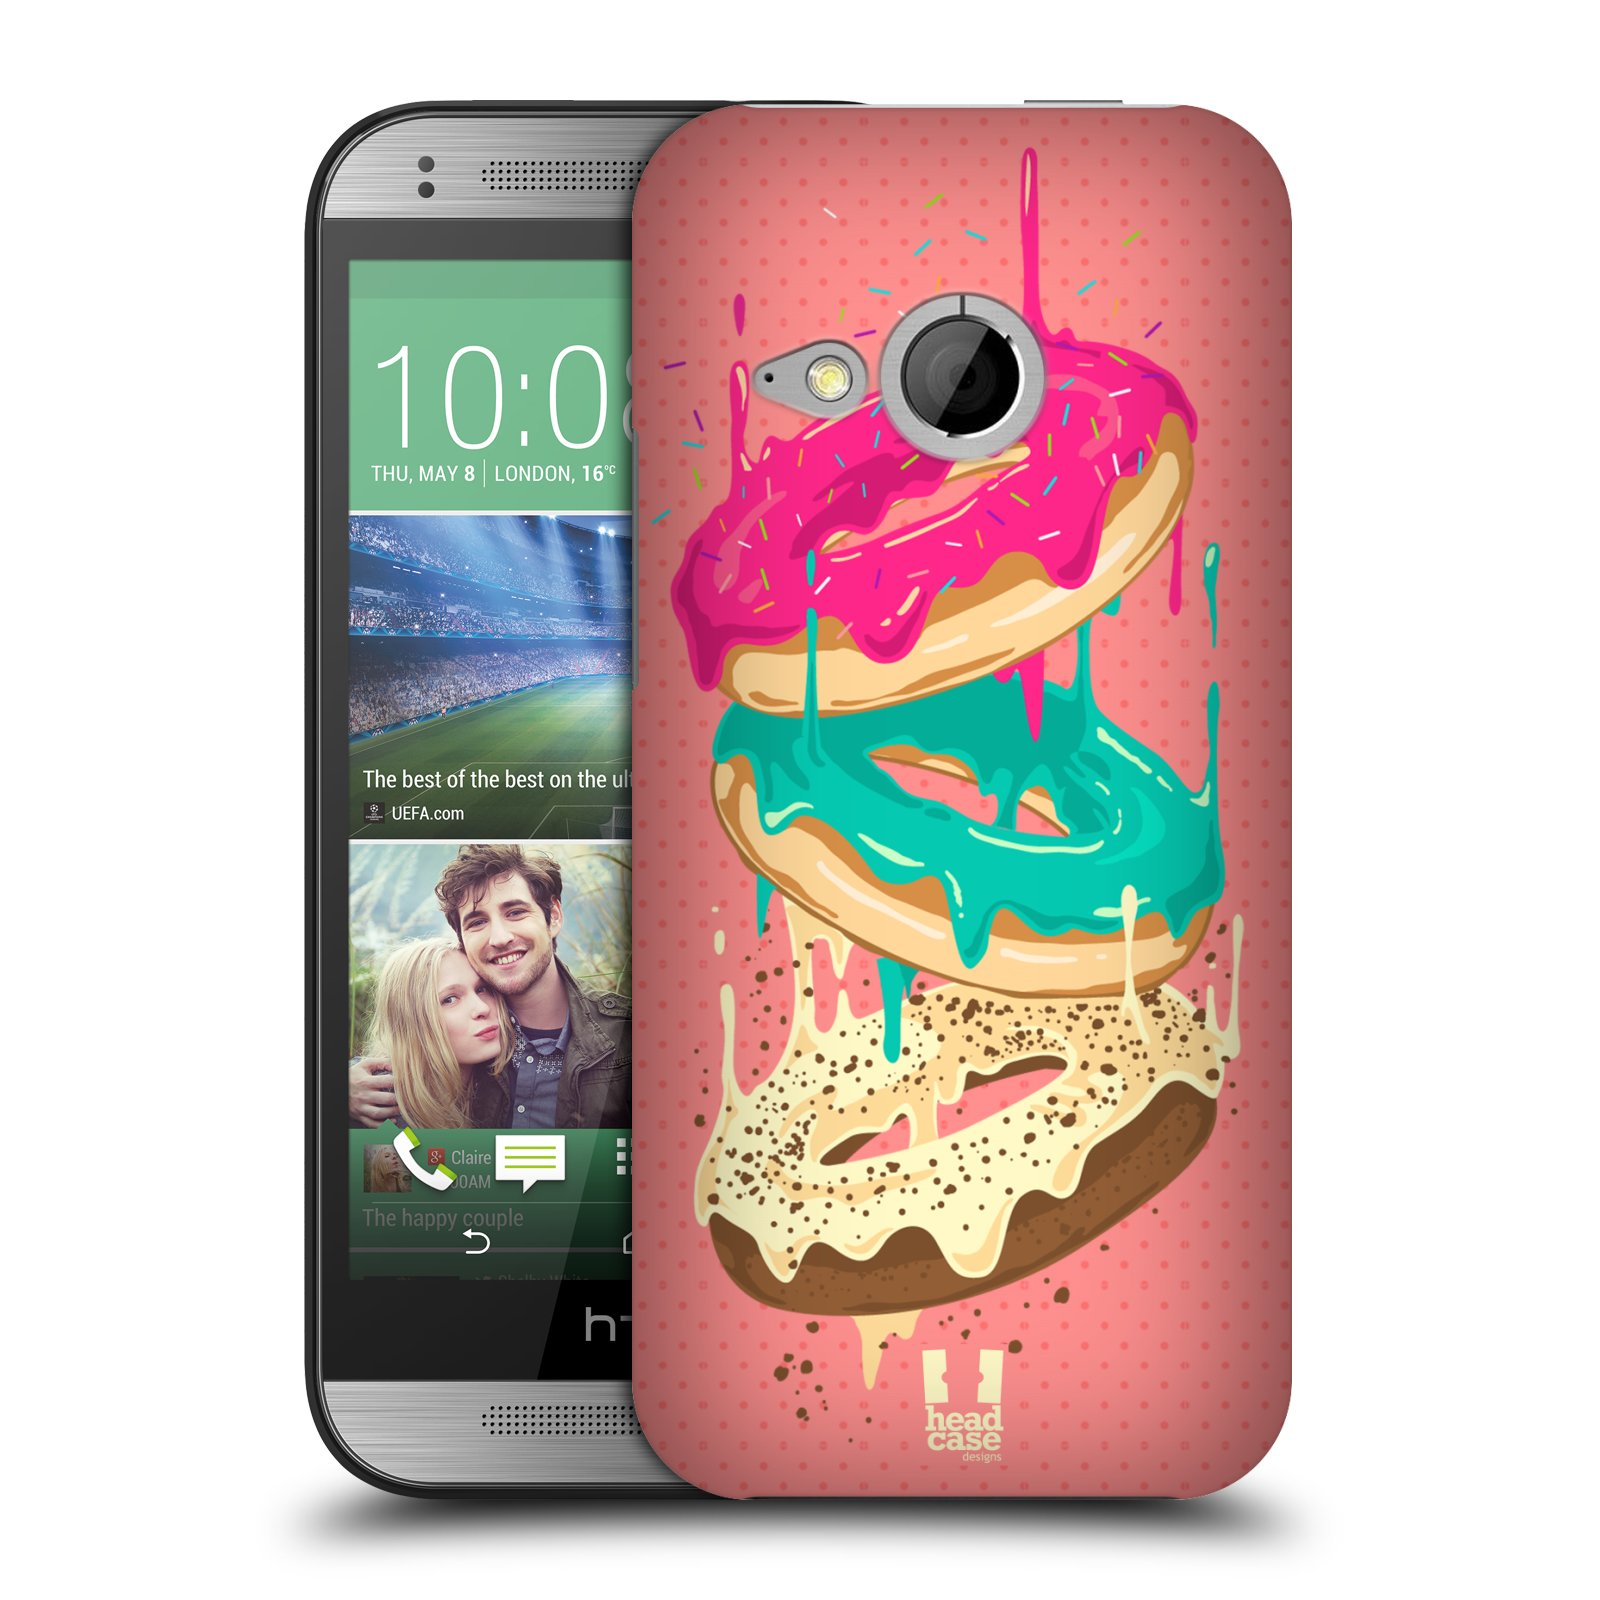 HEAD CASE DESIGNS DOUGHNUTS HARD BACK CASE FOR HTC ONE MINI 2